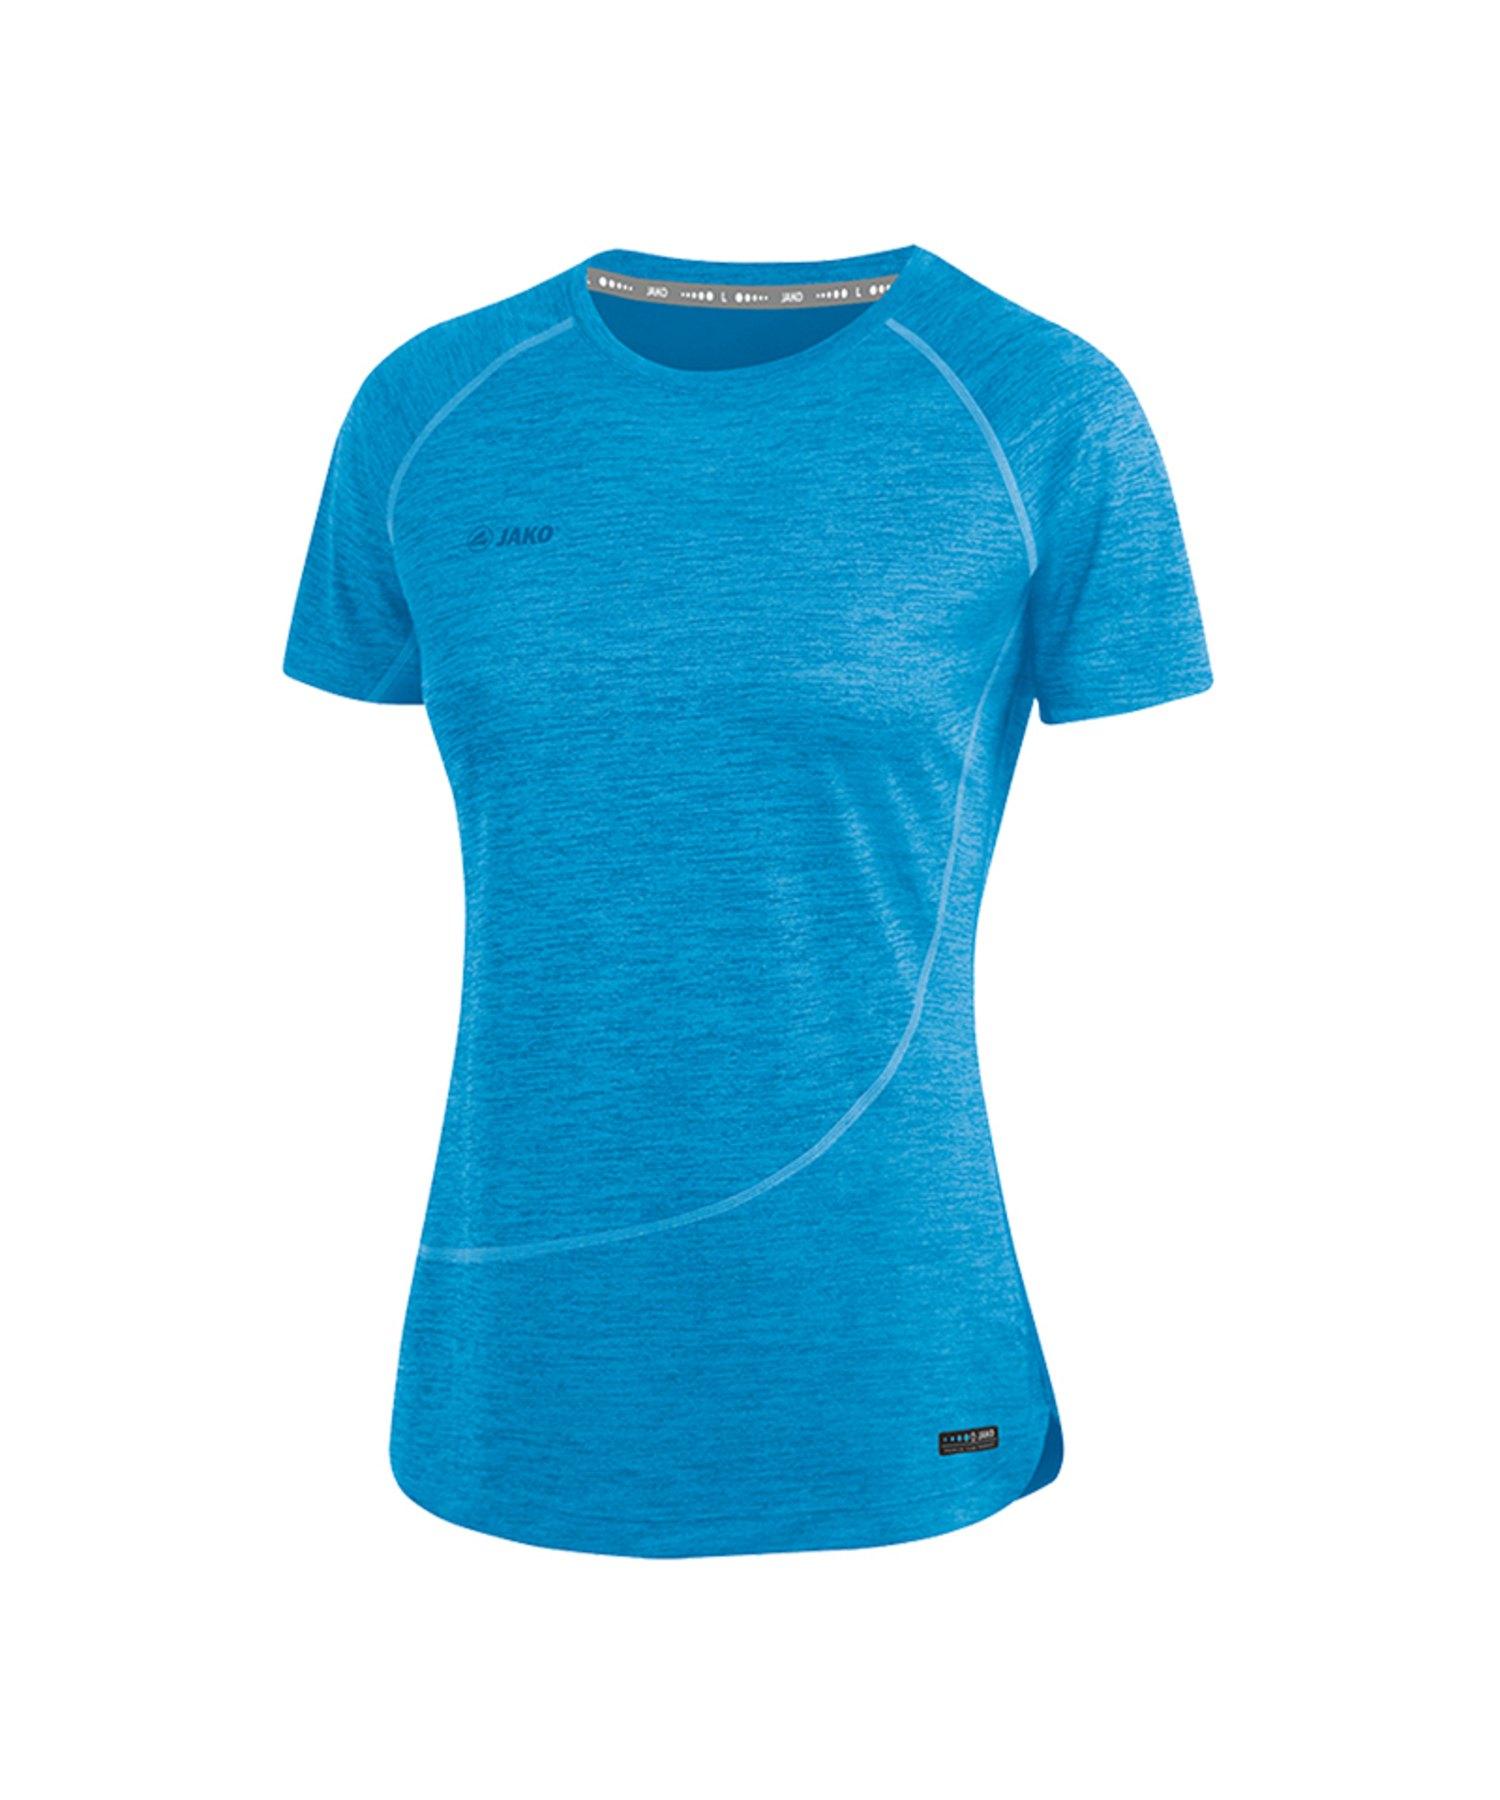 Jako T-Shirt Active Basics Damen Blau F89 - Blau